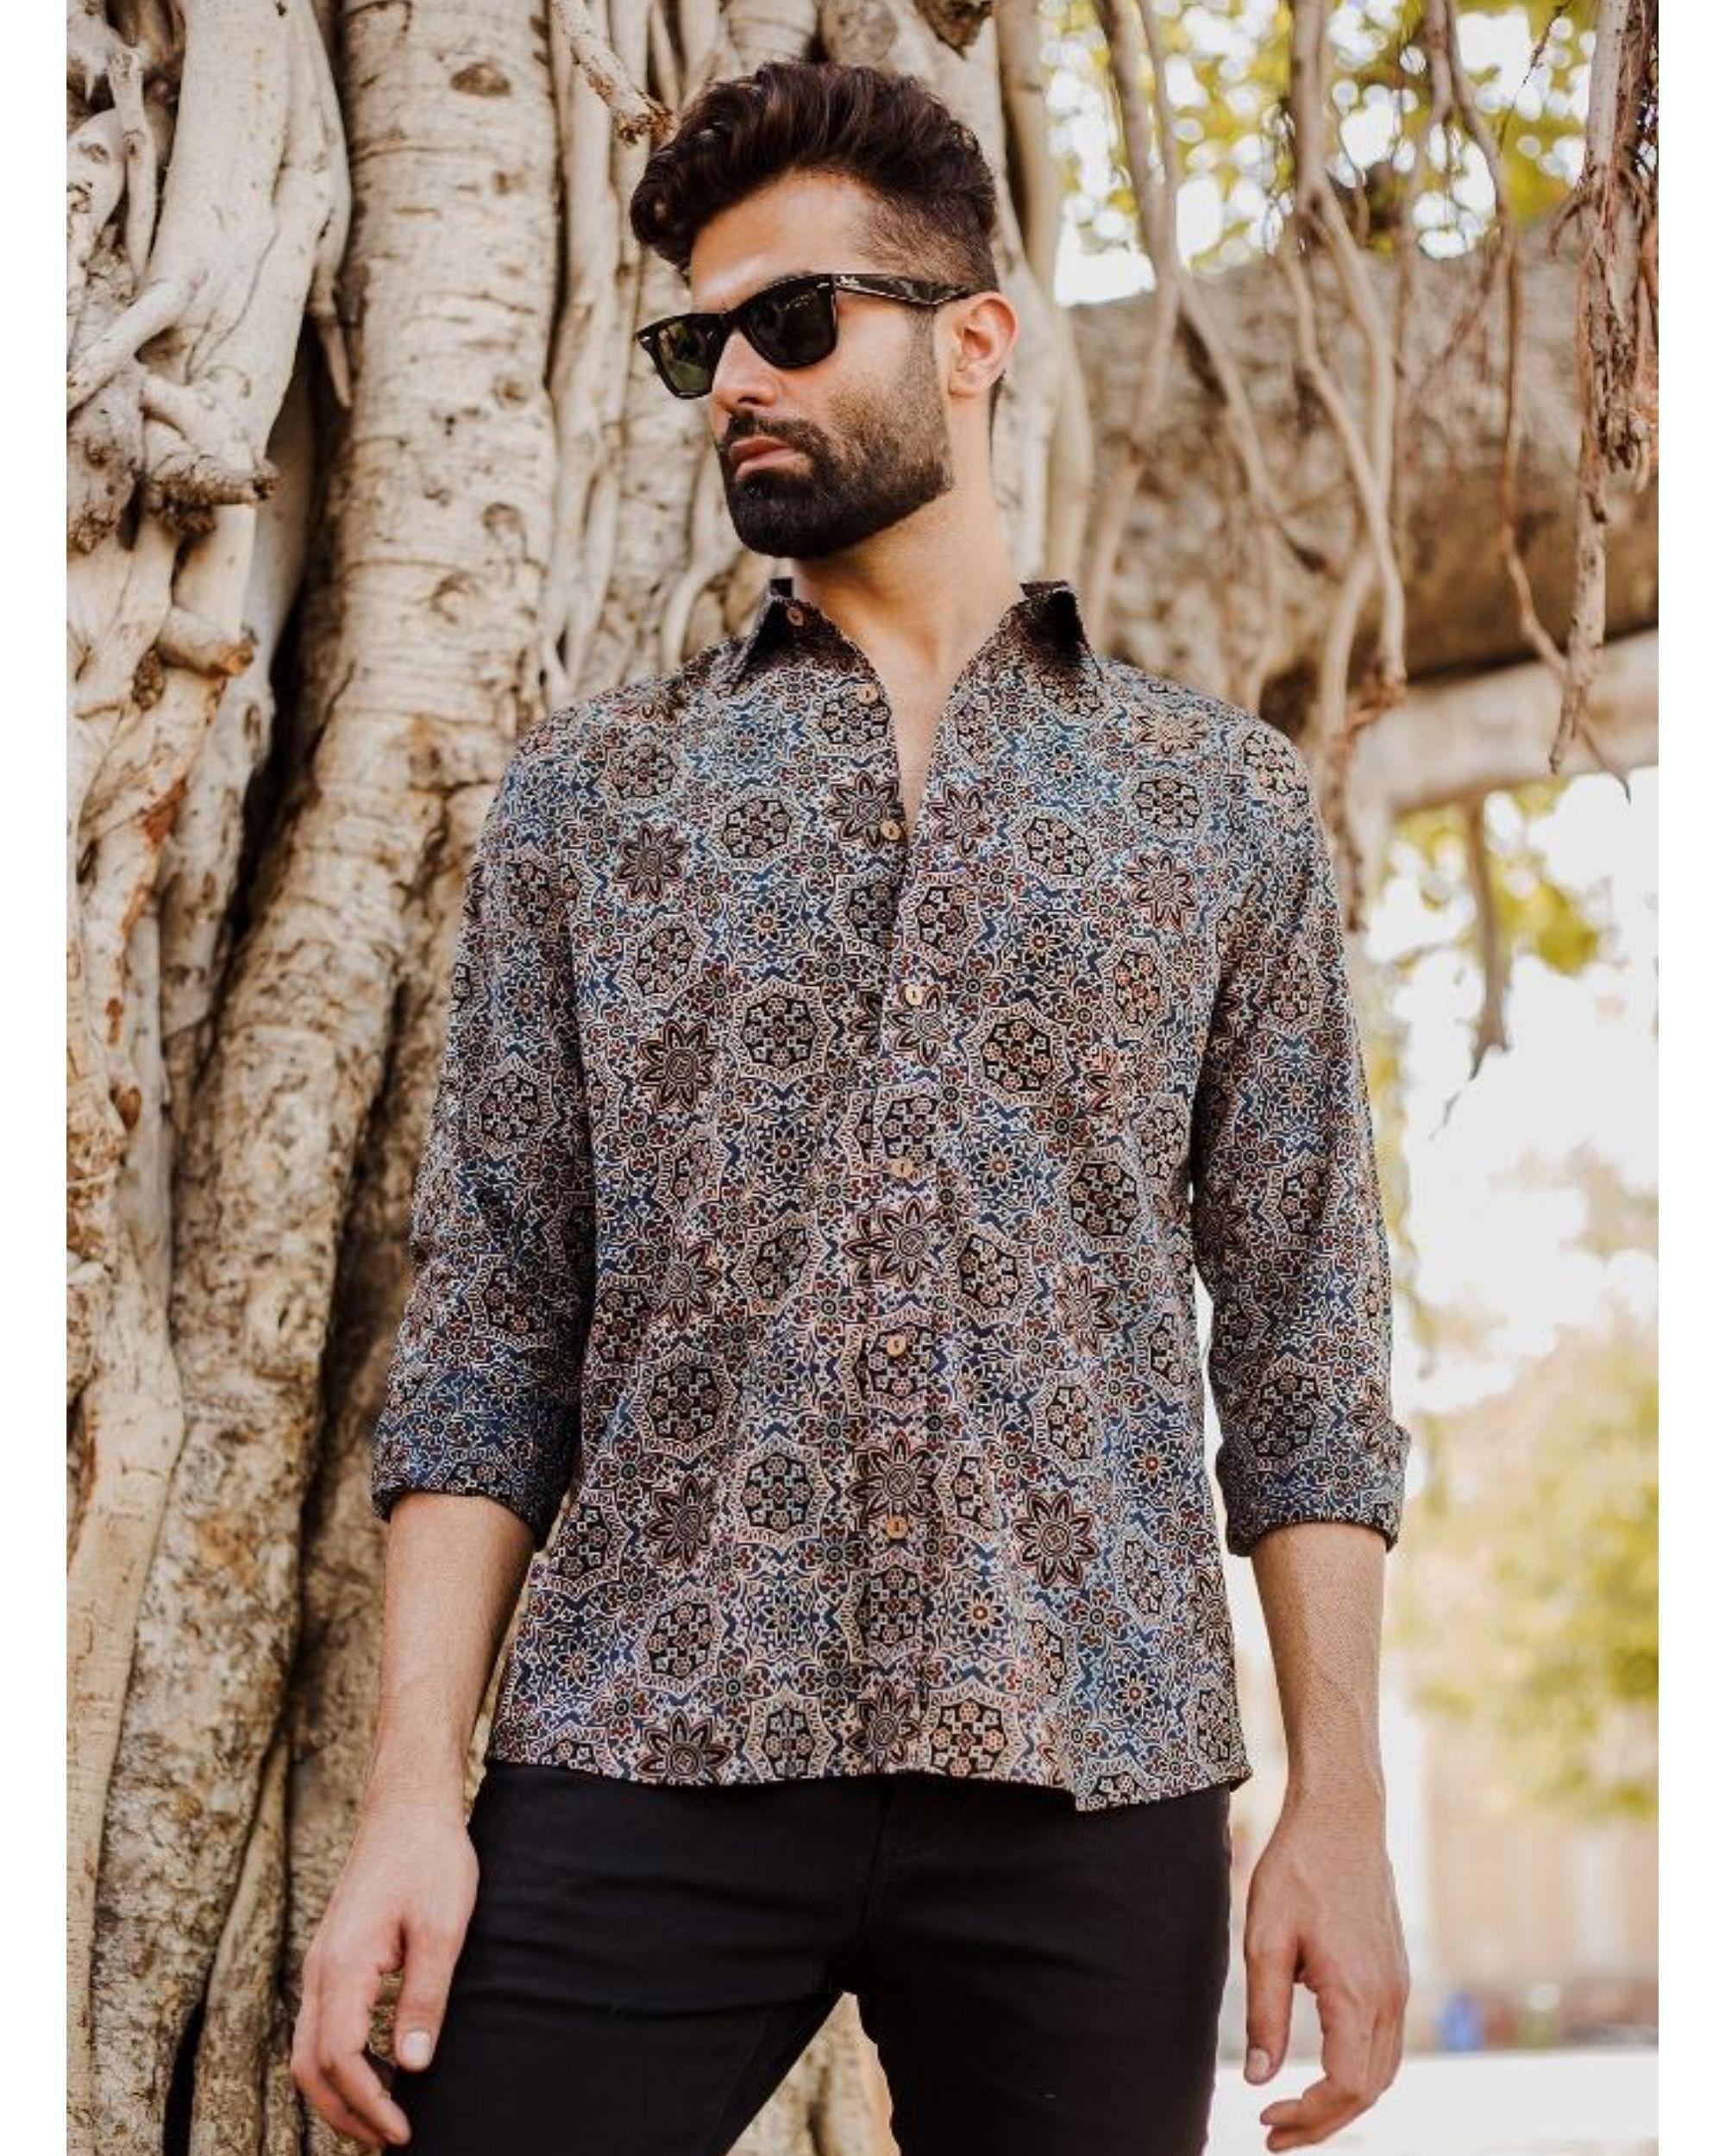 Blue and black ajrakh printed shirt